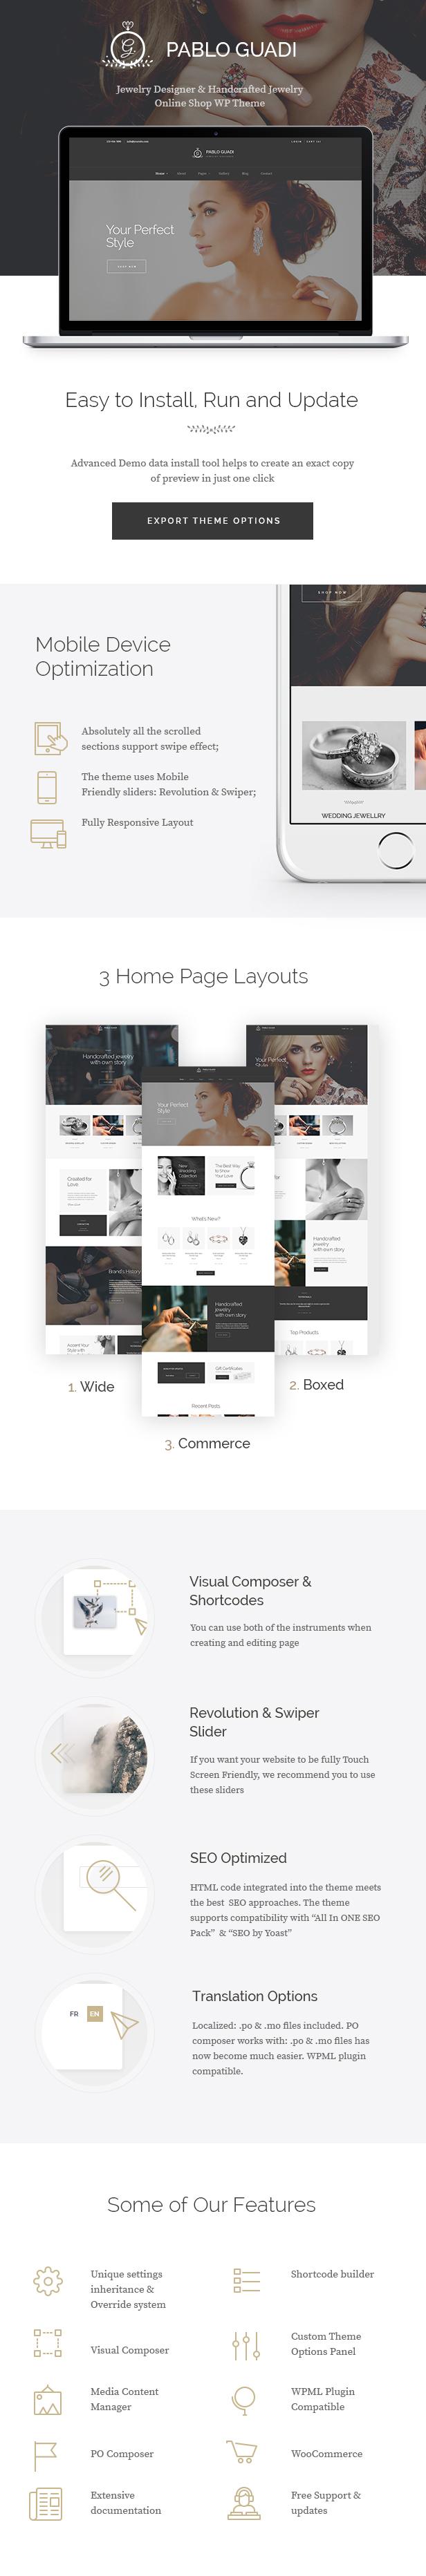 Pablo Guadi - Precious Stones Designer & Handcrafted Jewelry Online Shop WordPress Theme - 1